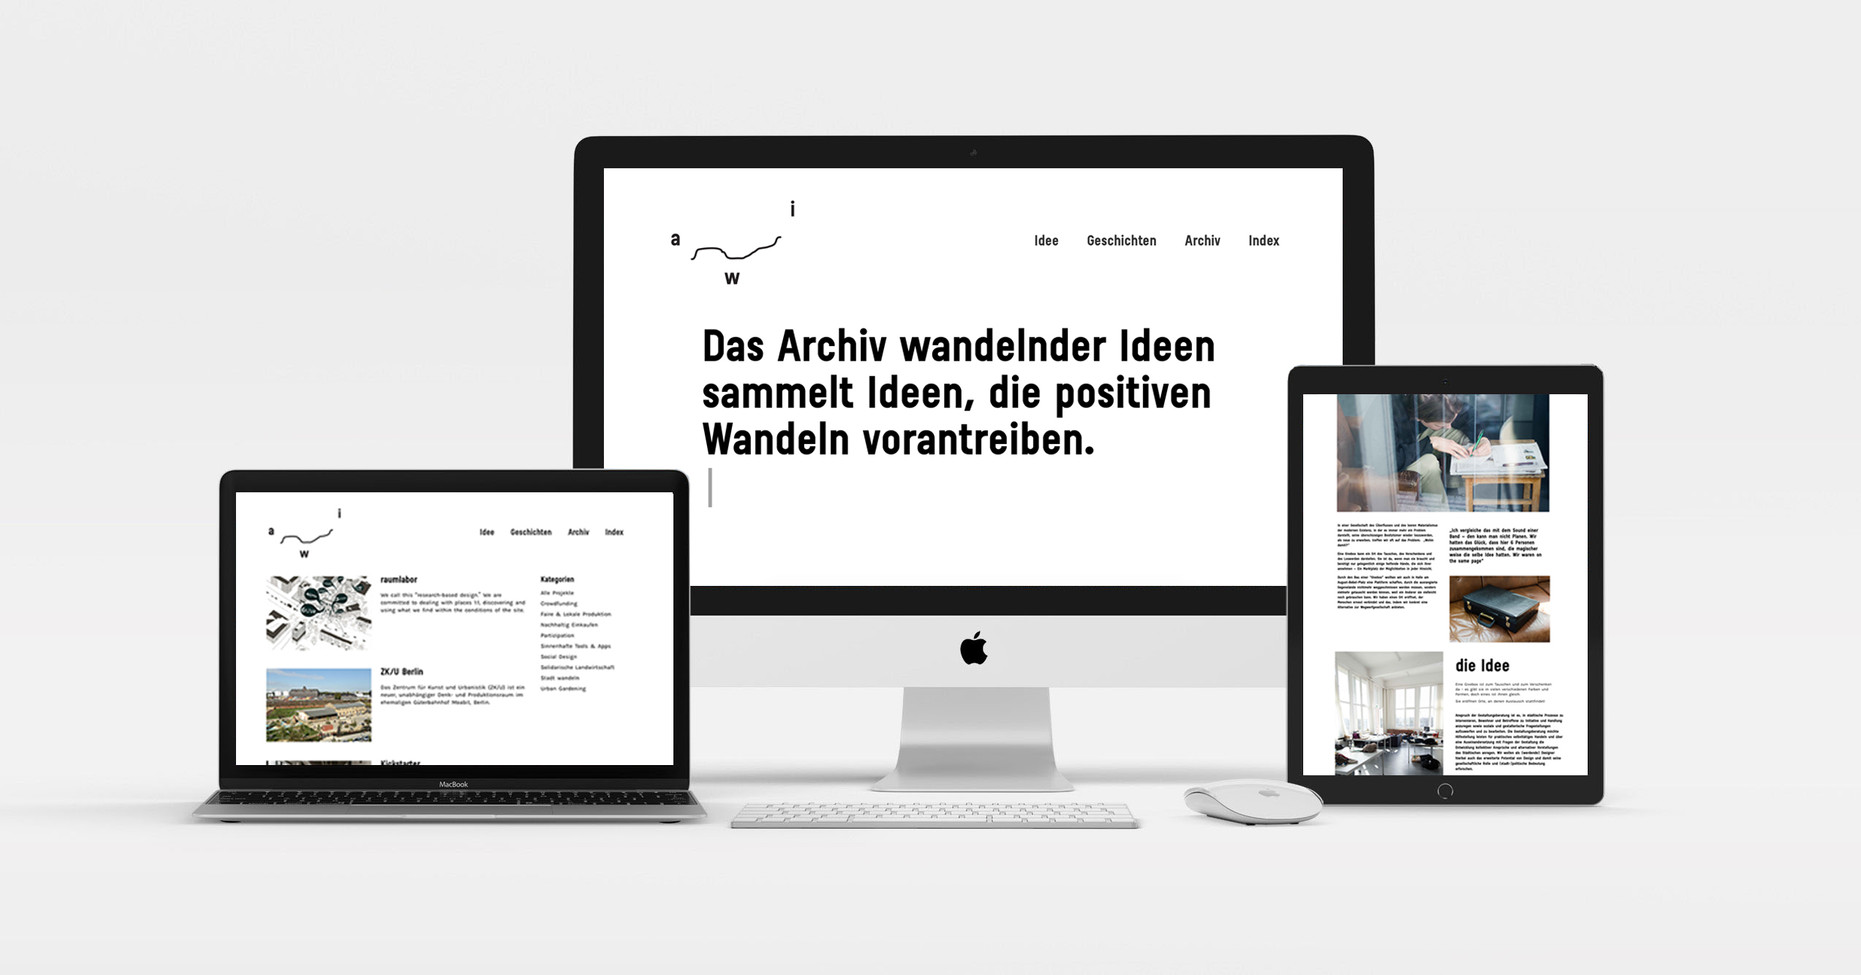 ARCHIVE OF TRANSFORMATIVE IDEAS |WEBSITE